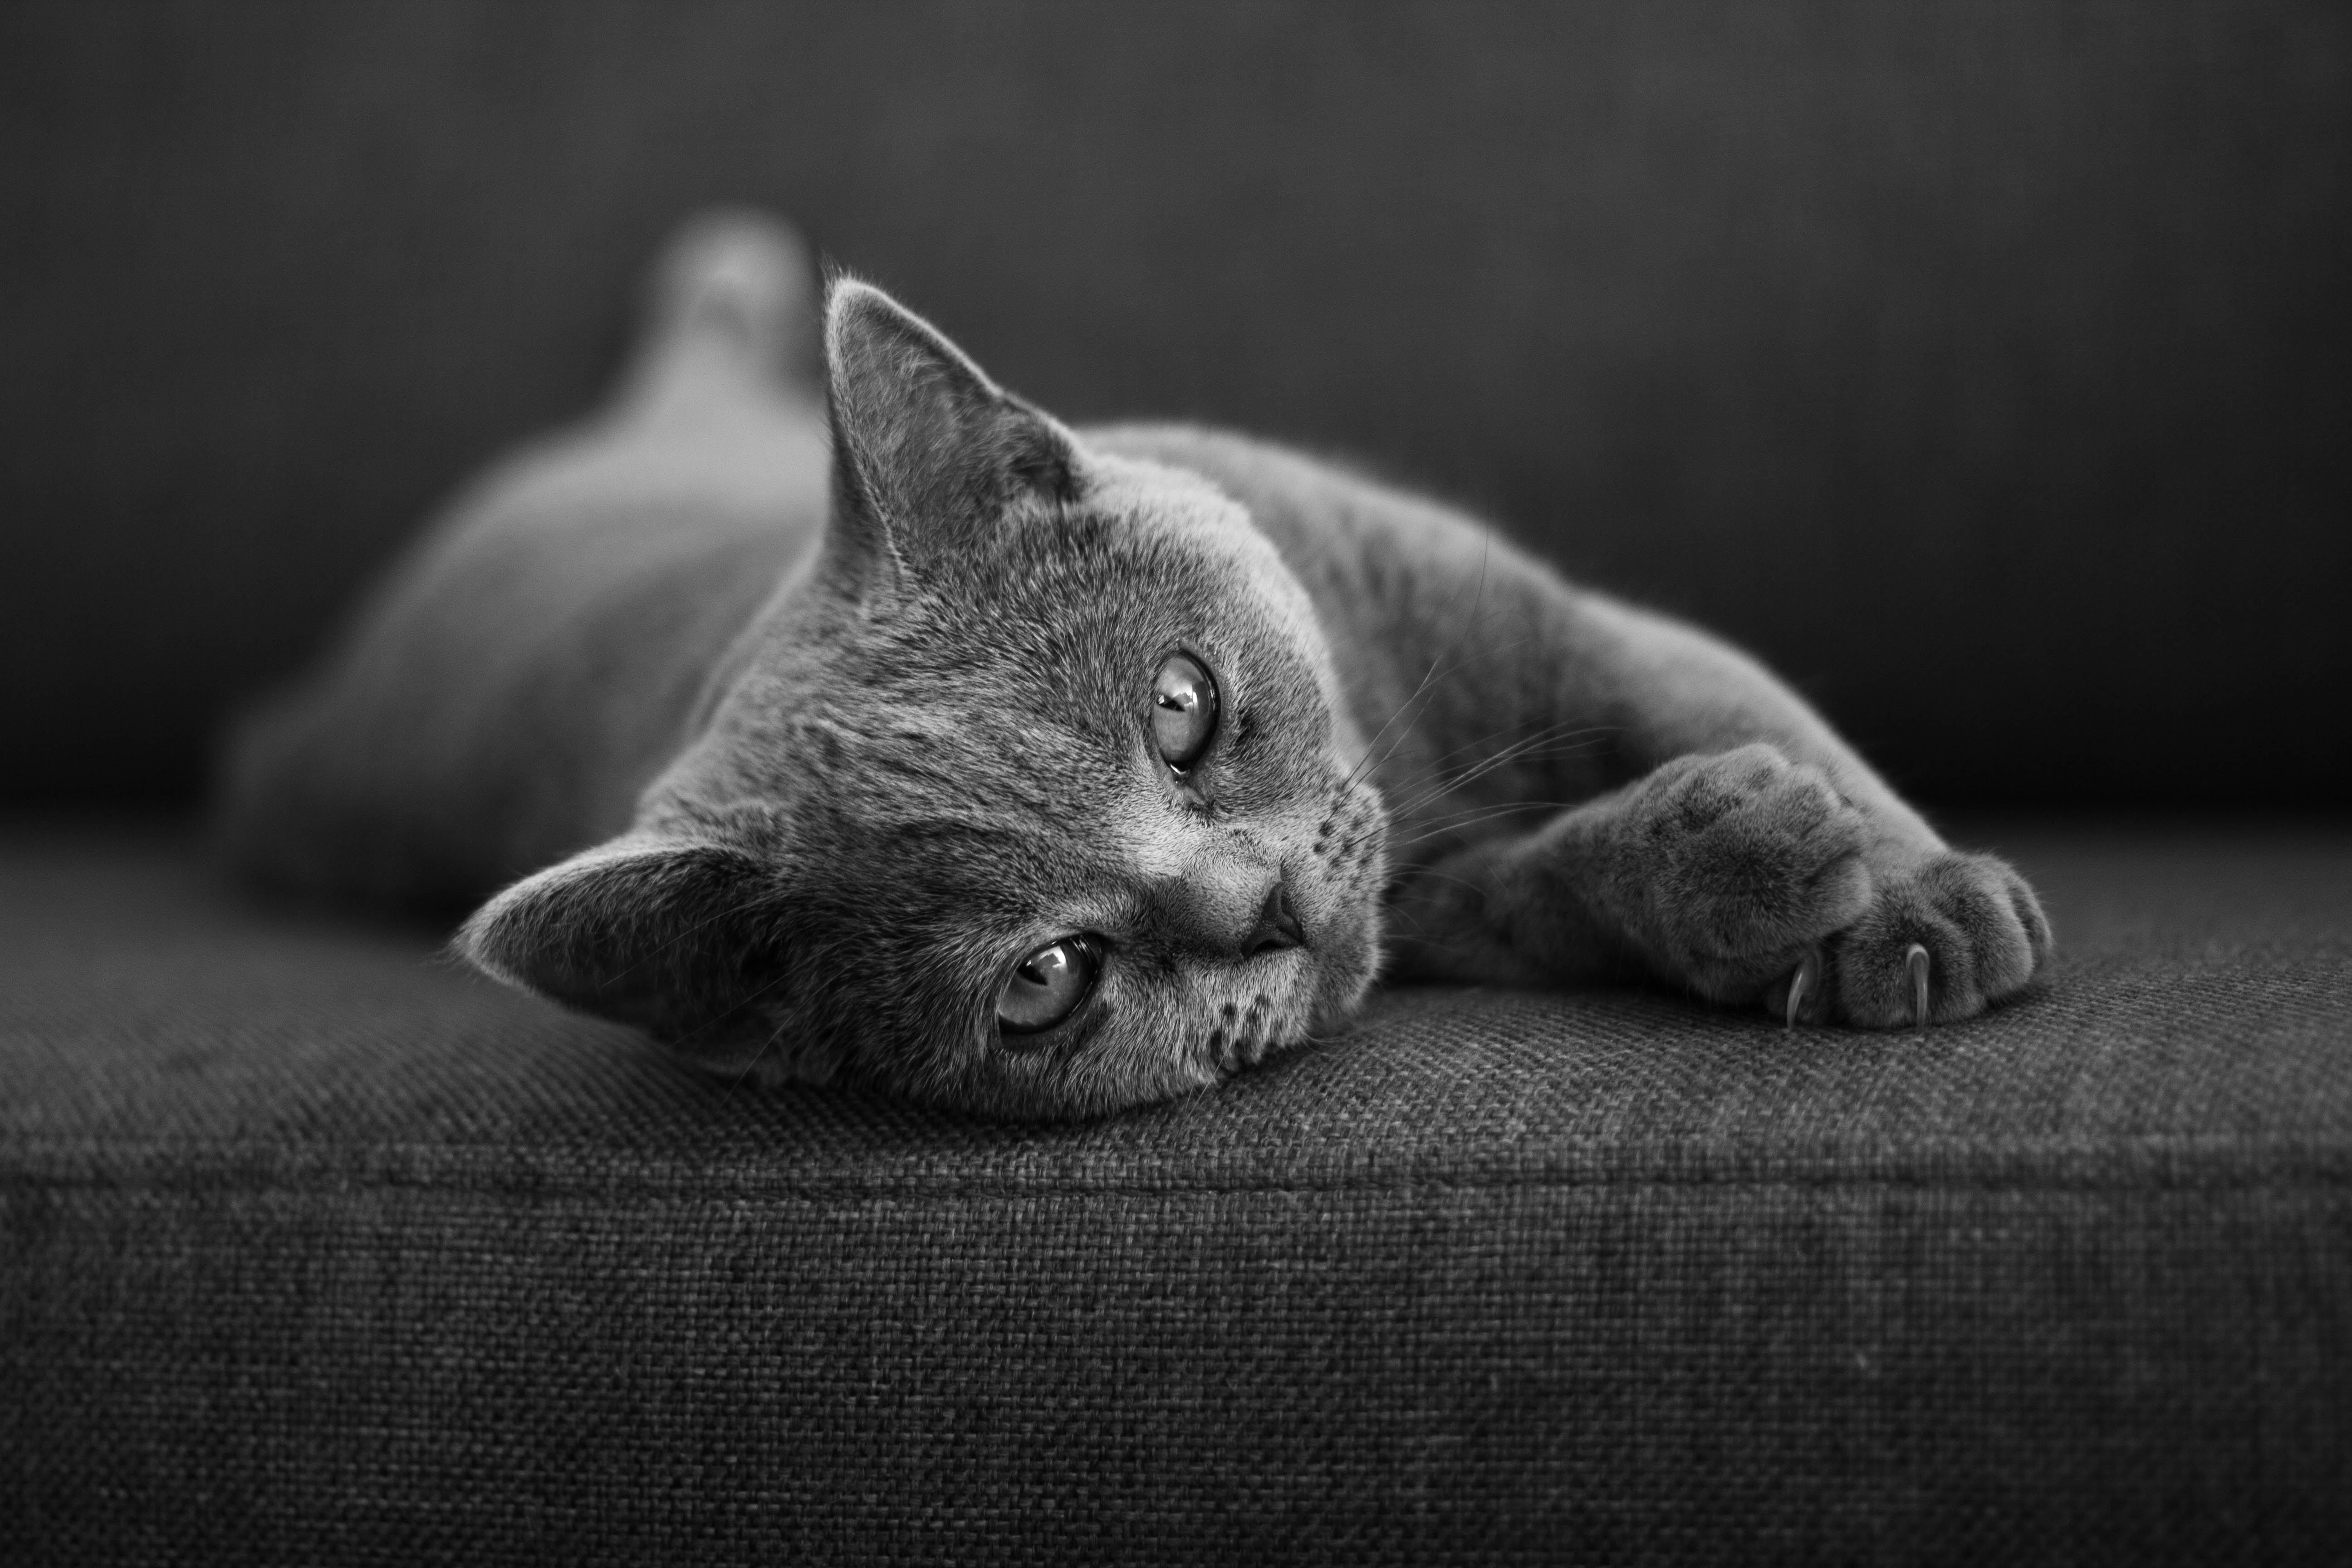 cat lying on cushion